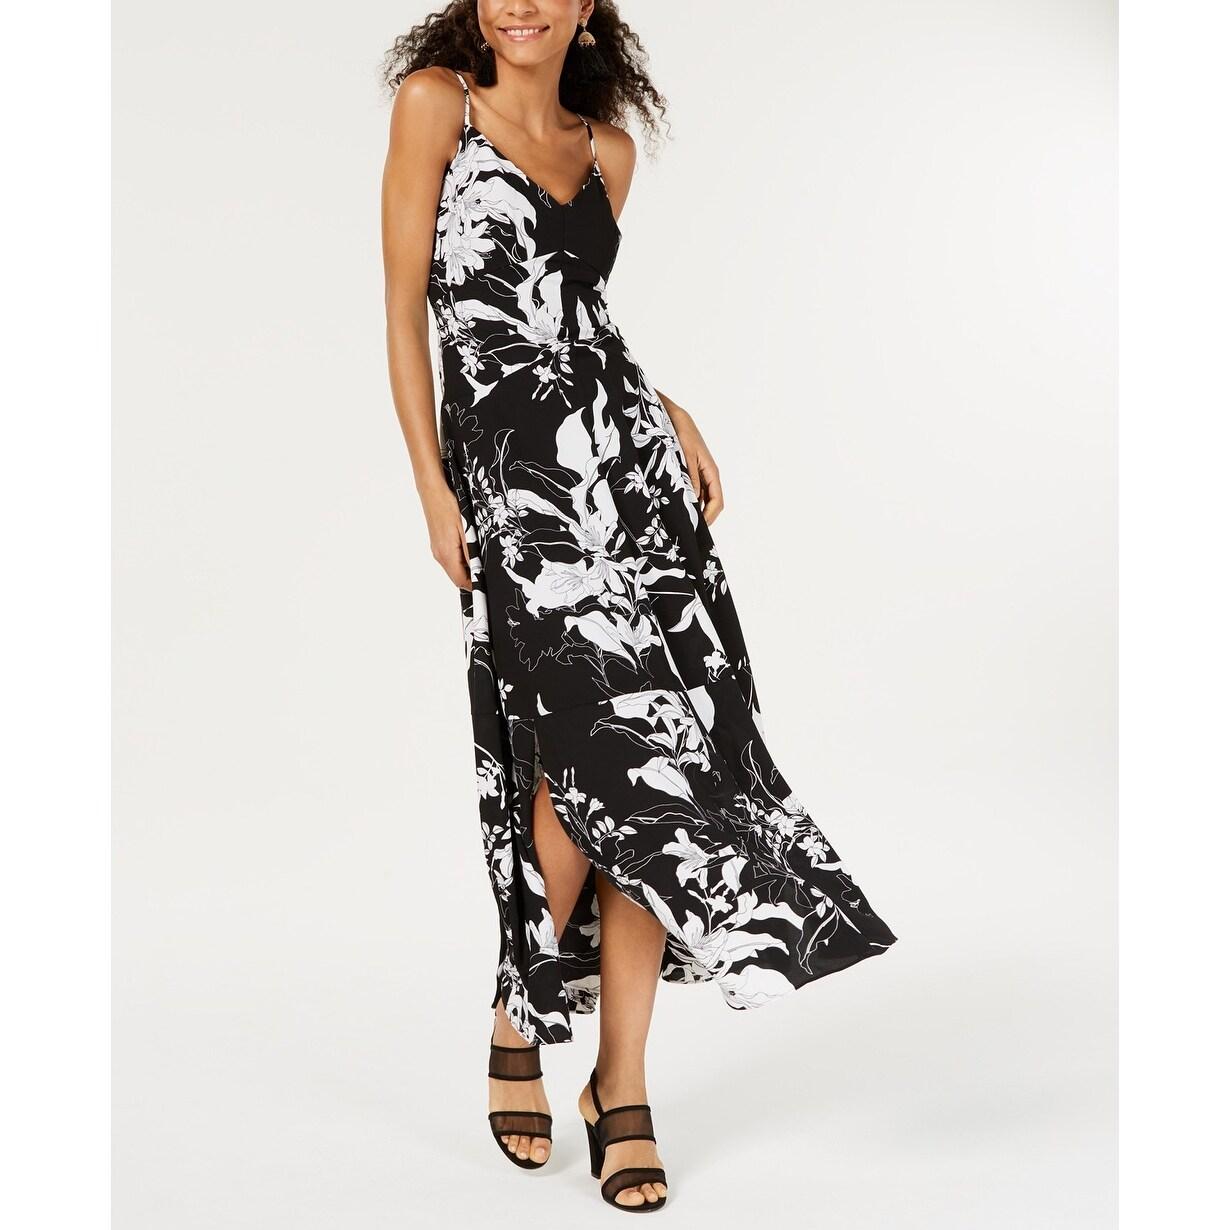 $298 Bar Iii Women/'S White Floral-Printed V-Neck Sleeveless Maxi Dress Size 8